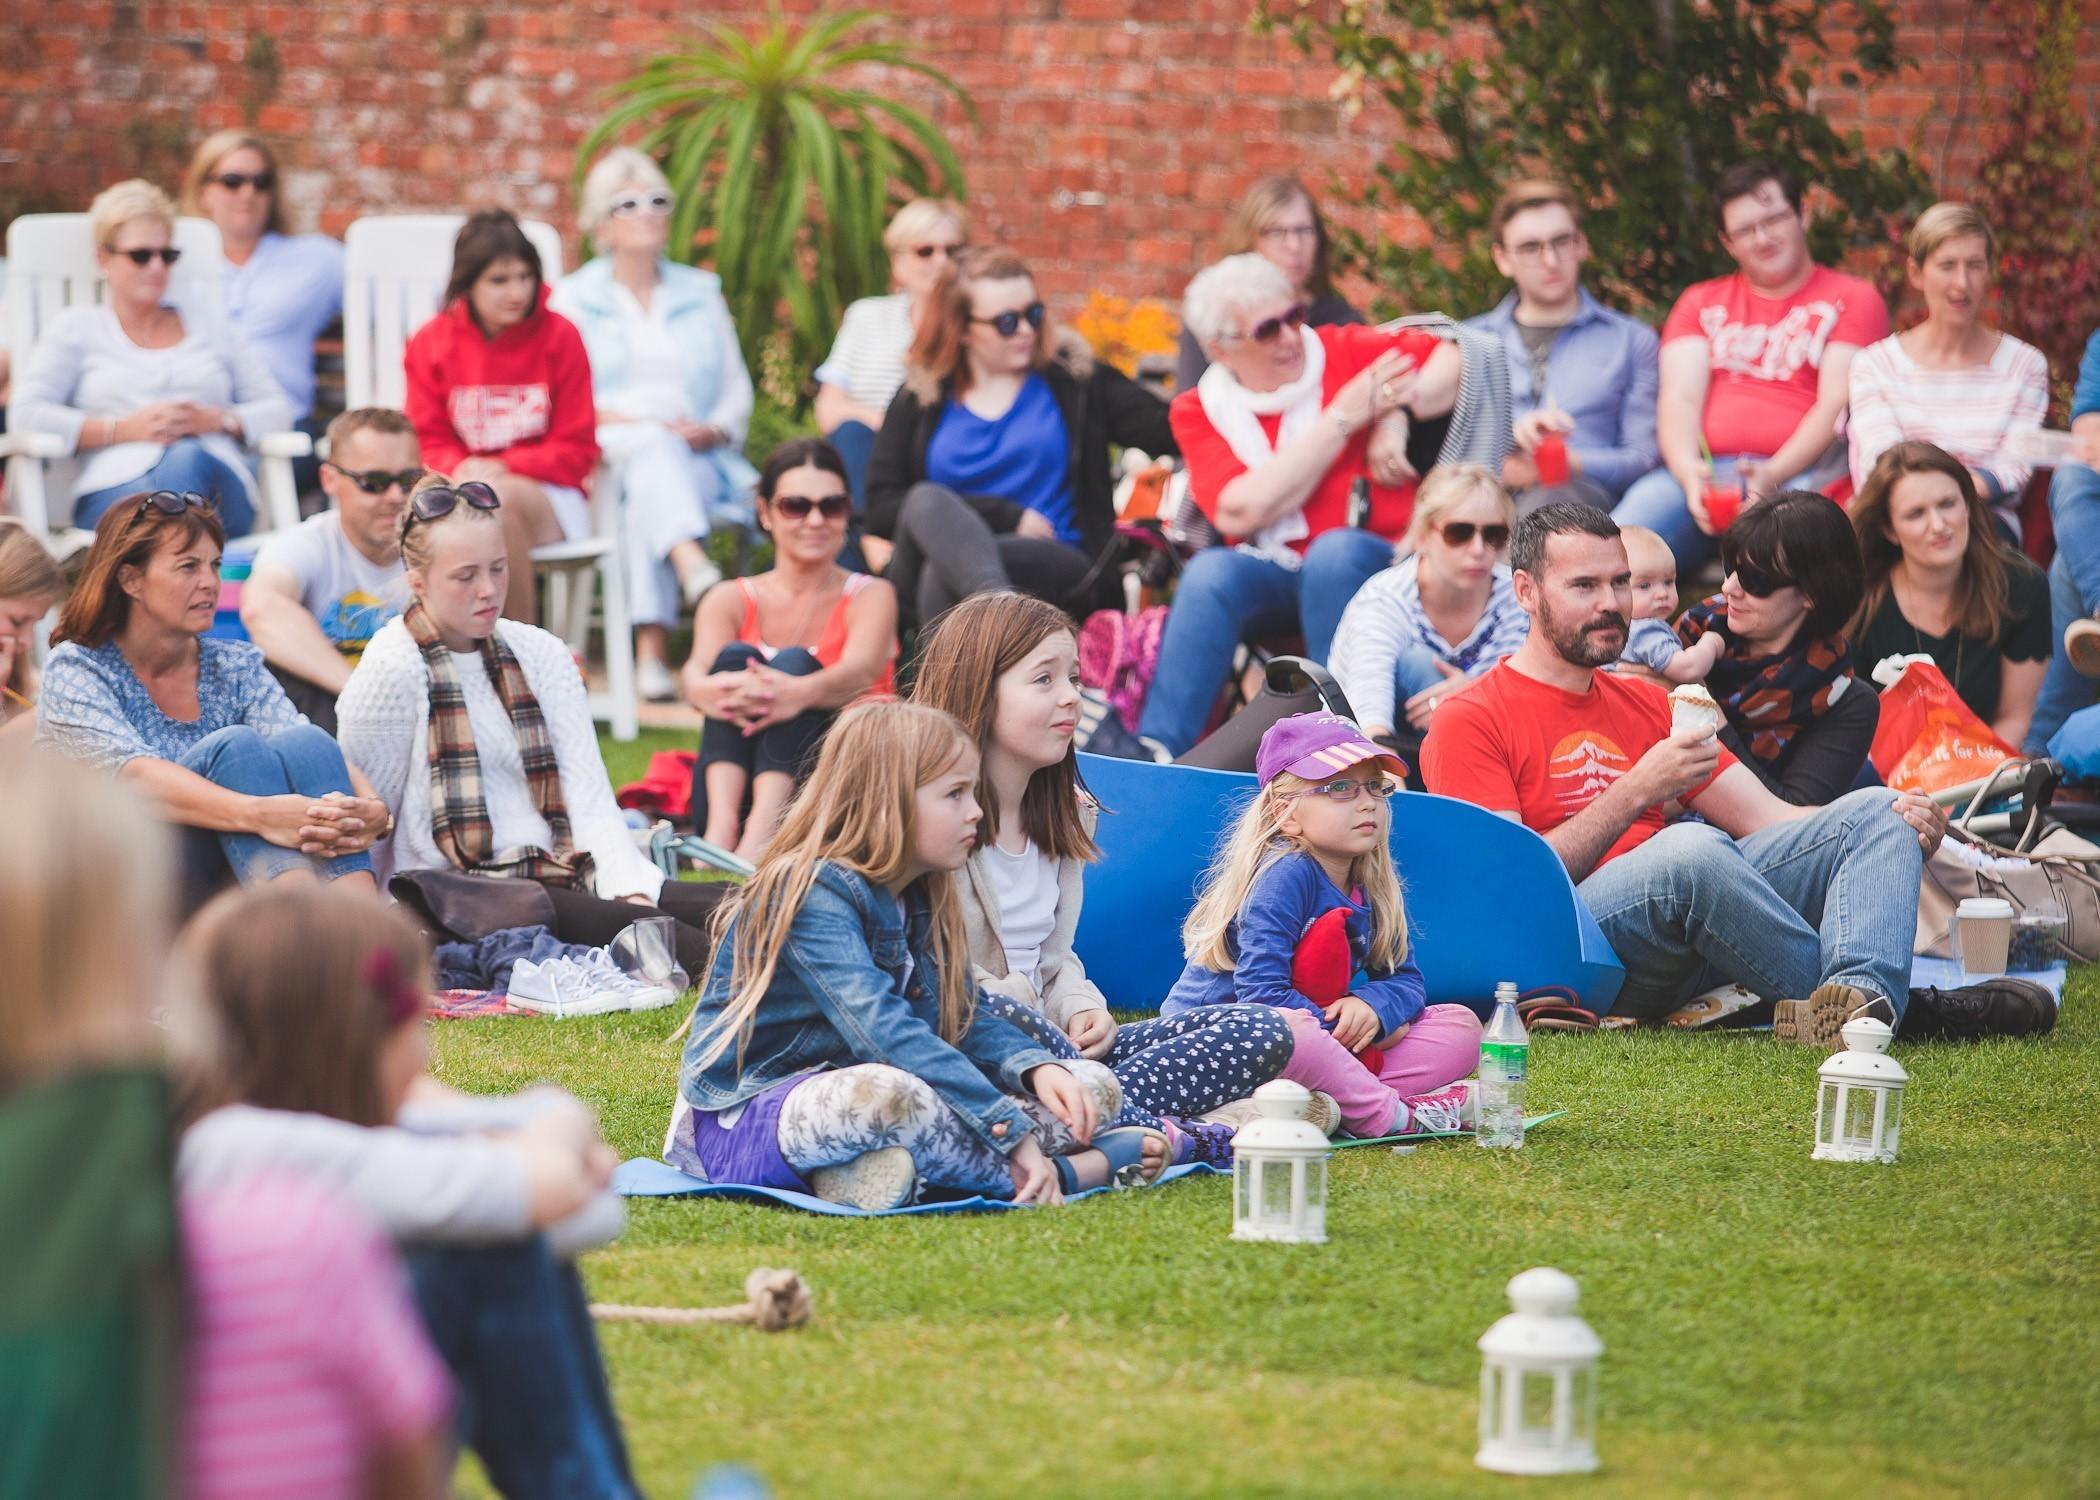 children-sitting-on-lawn-in-a-crowd.jpg?mtime=20180430094921#asset:919